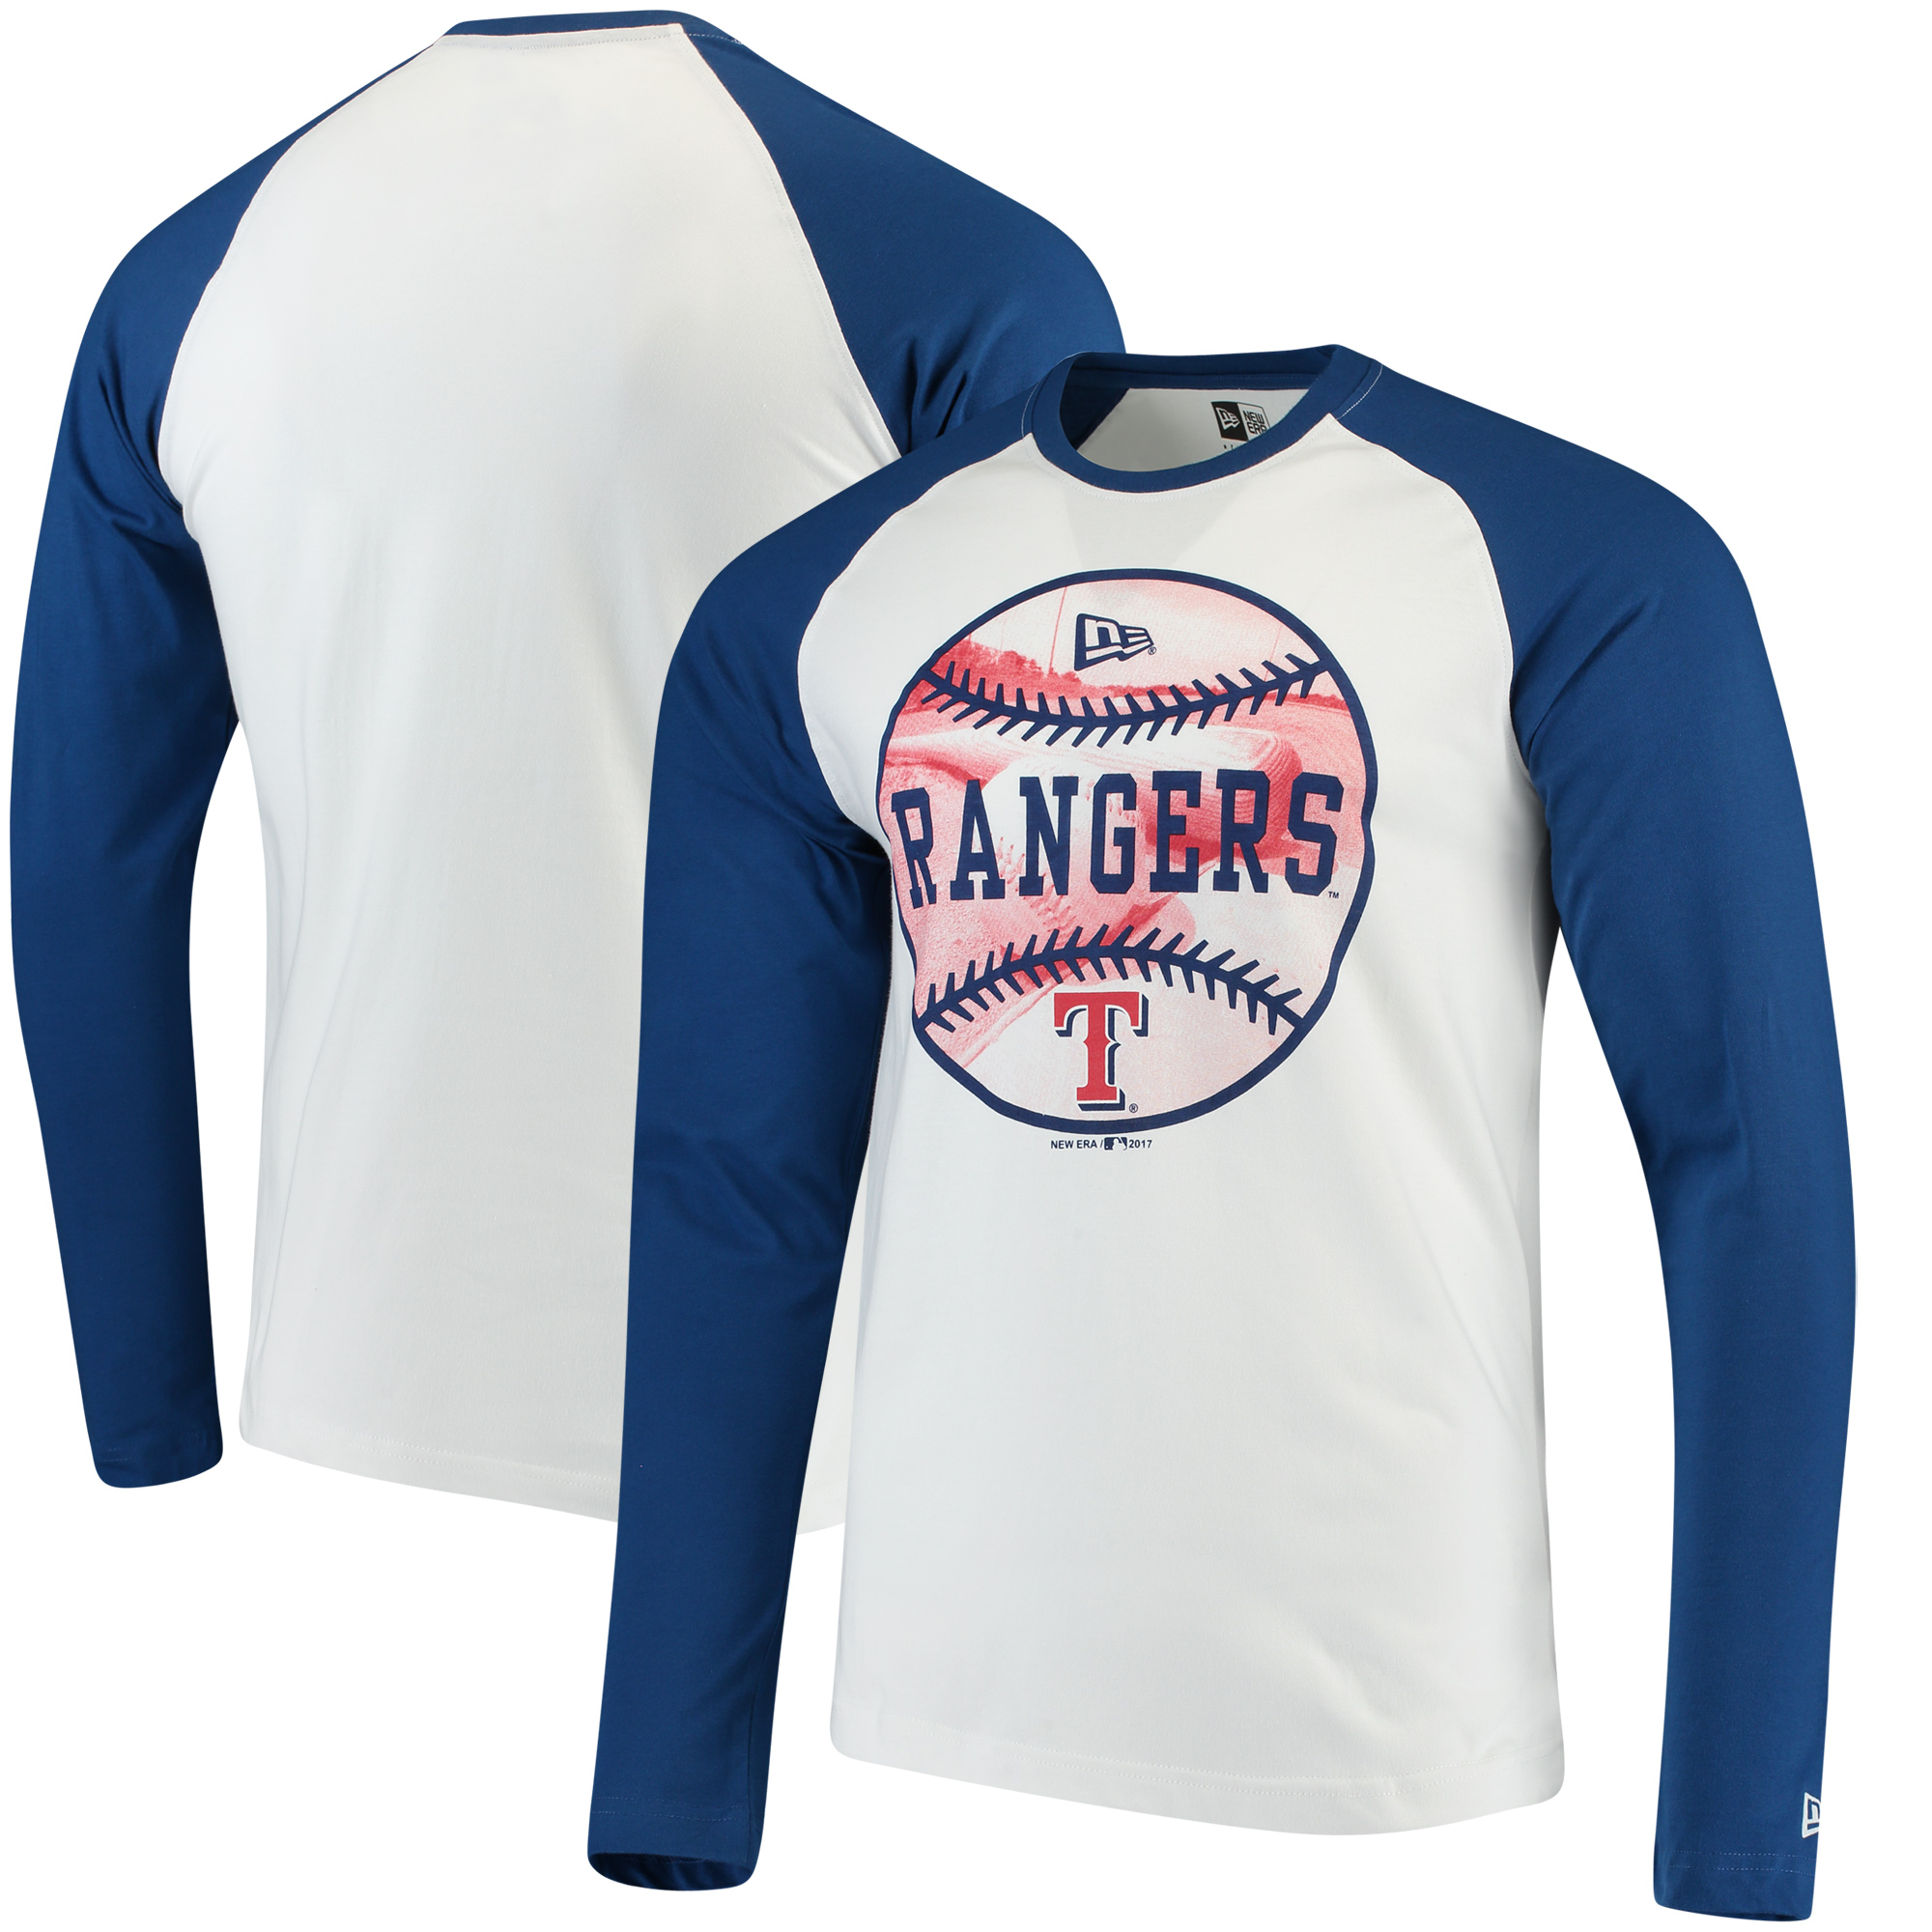 Texas Rangers New Era Raglan Long Sleeve T-Shirt - White/Royal